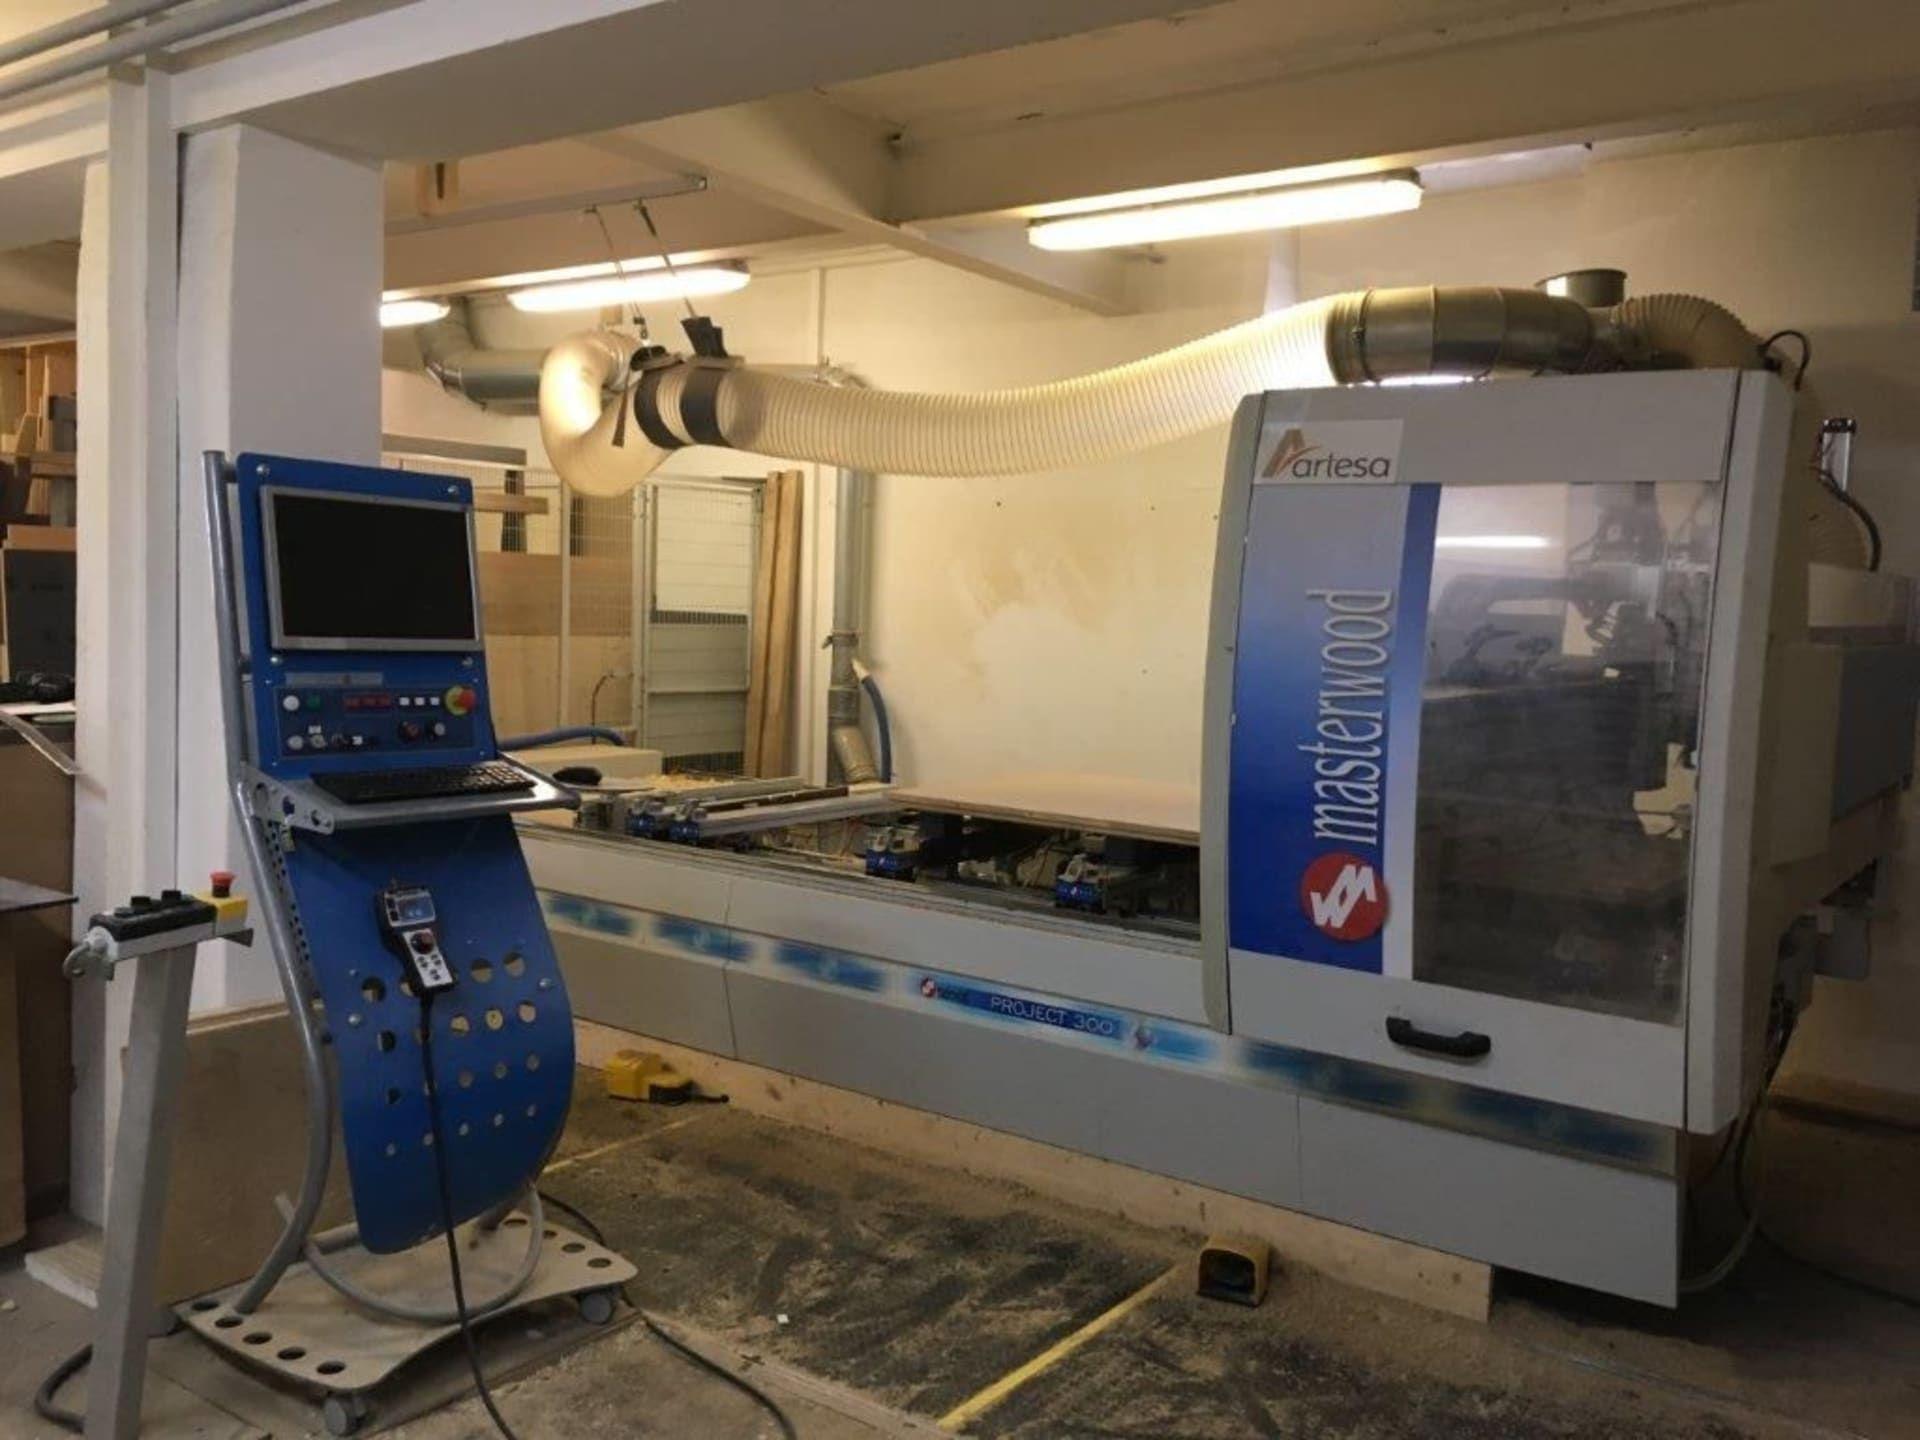 PROYECTO MASTERWOOD 3000 CNC-Bearbeitungszentrum